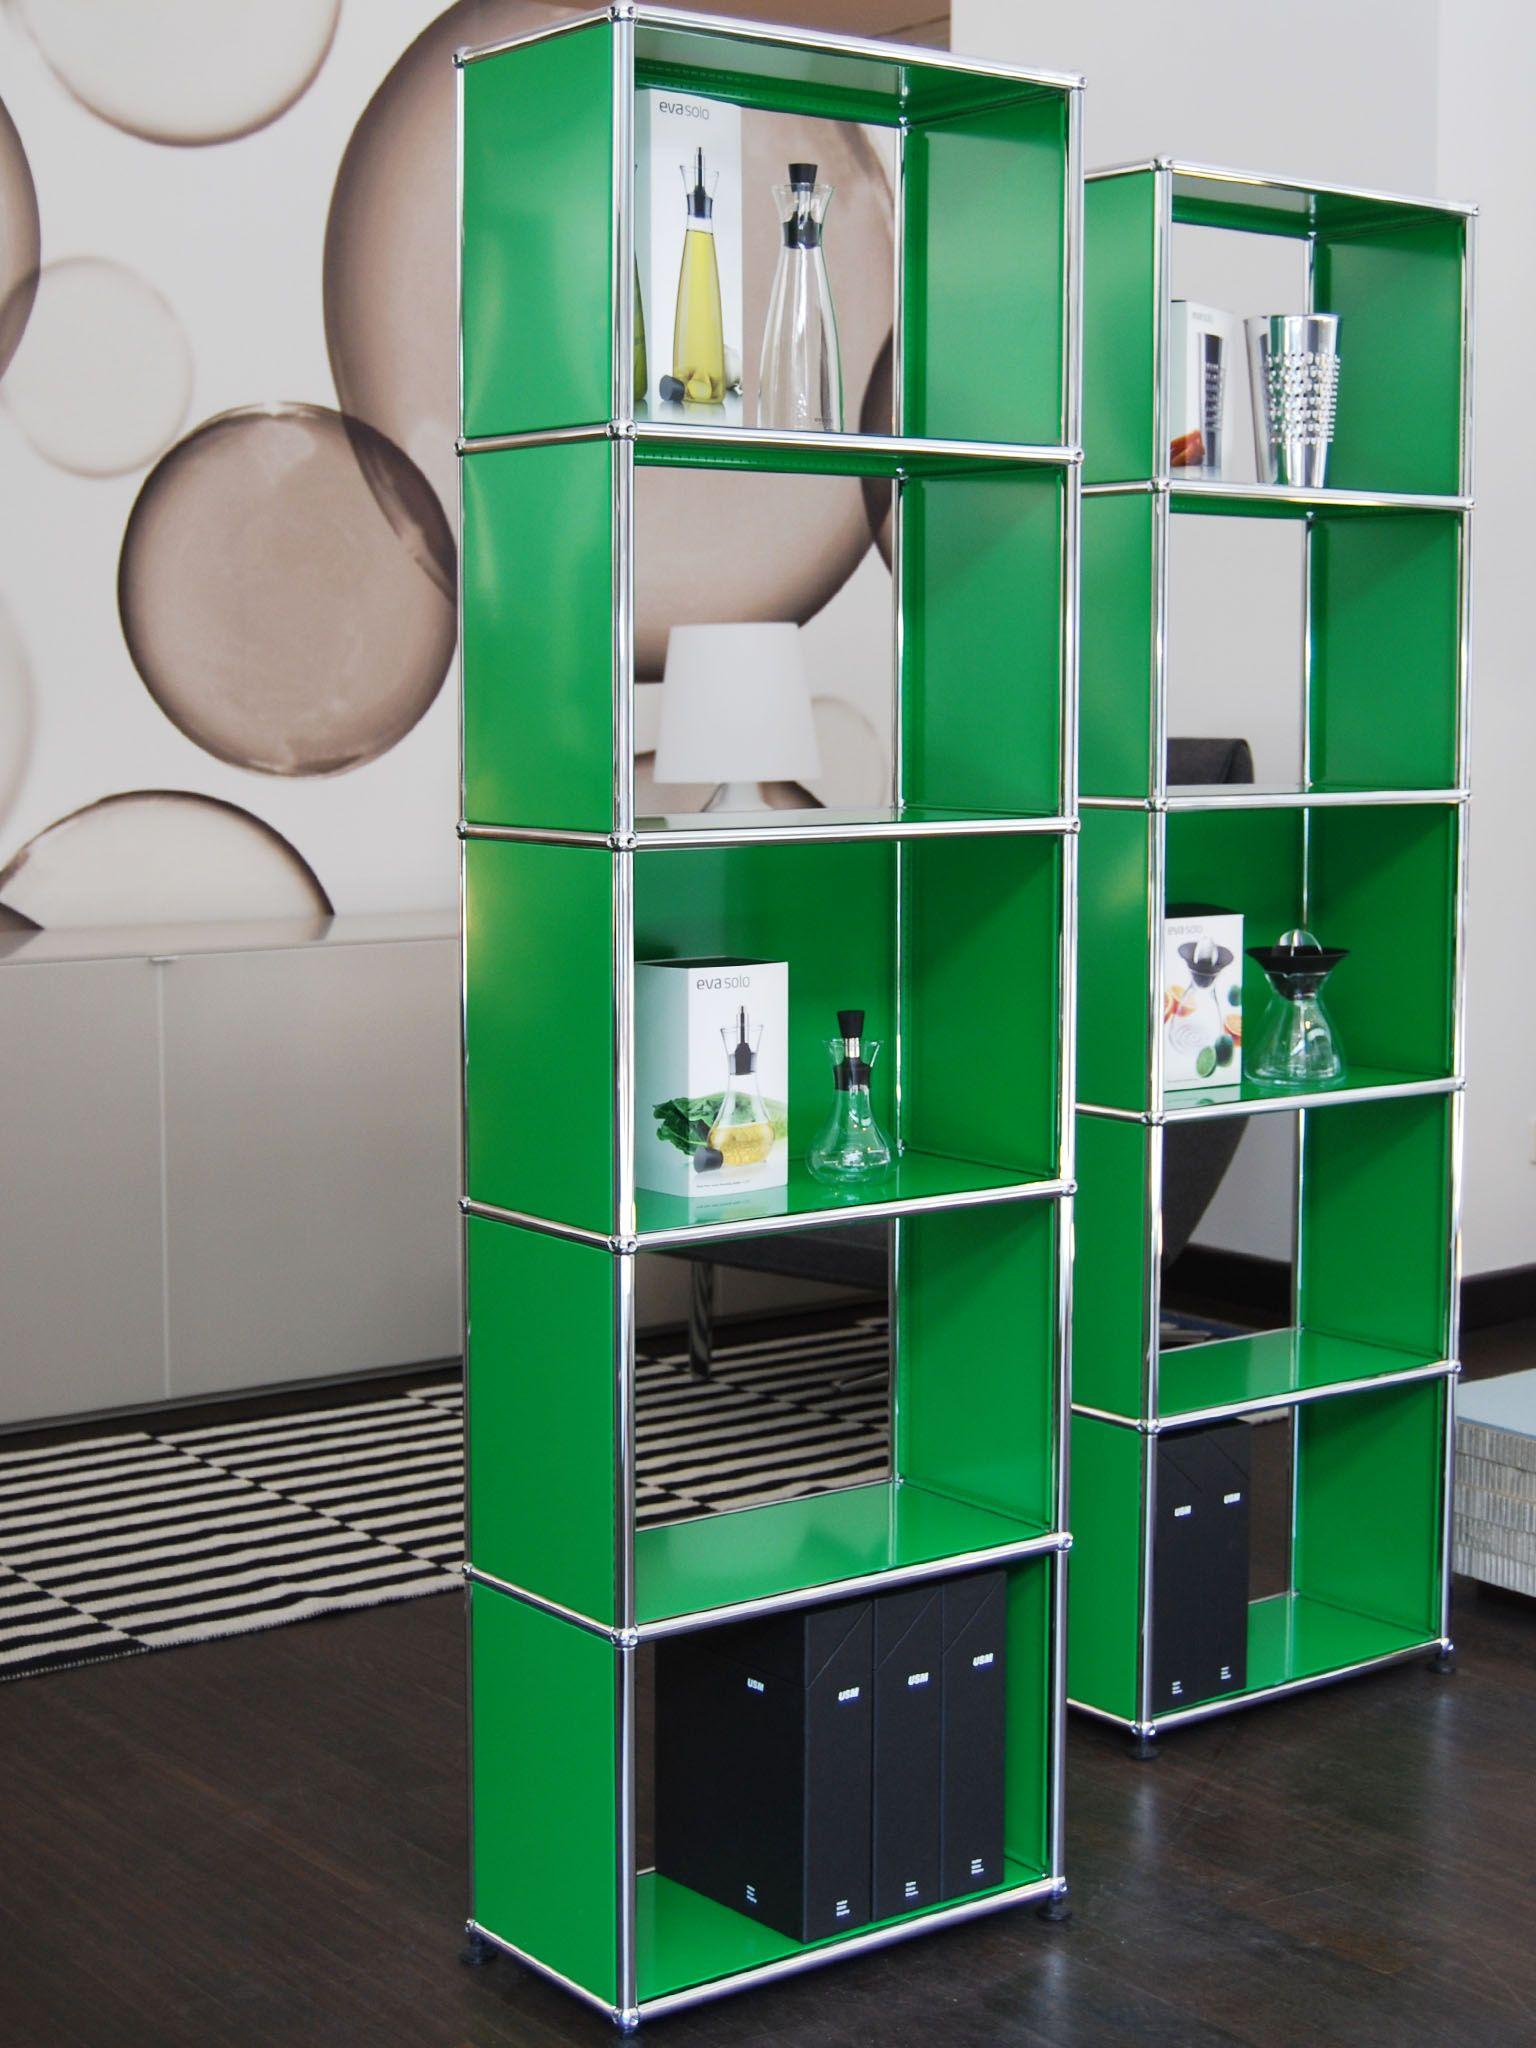 Epingle Sur Green Attitude By Espace Contemporain